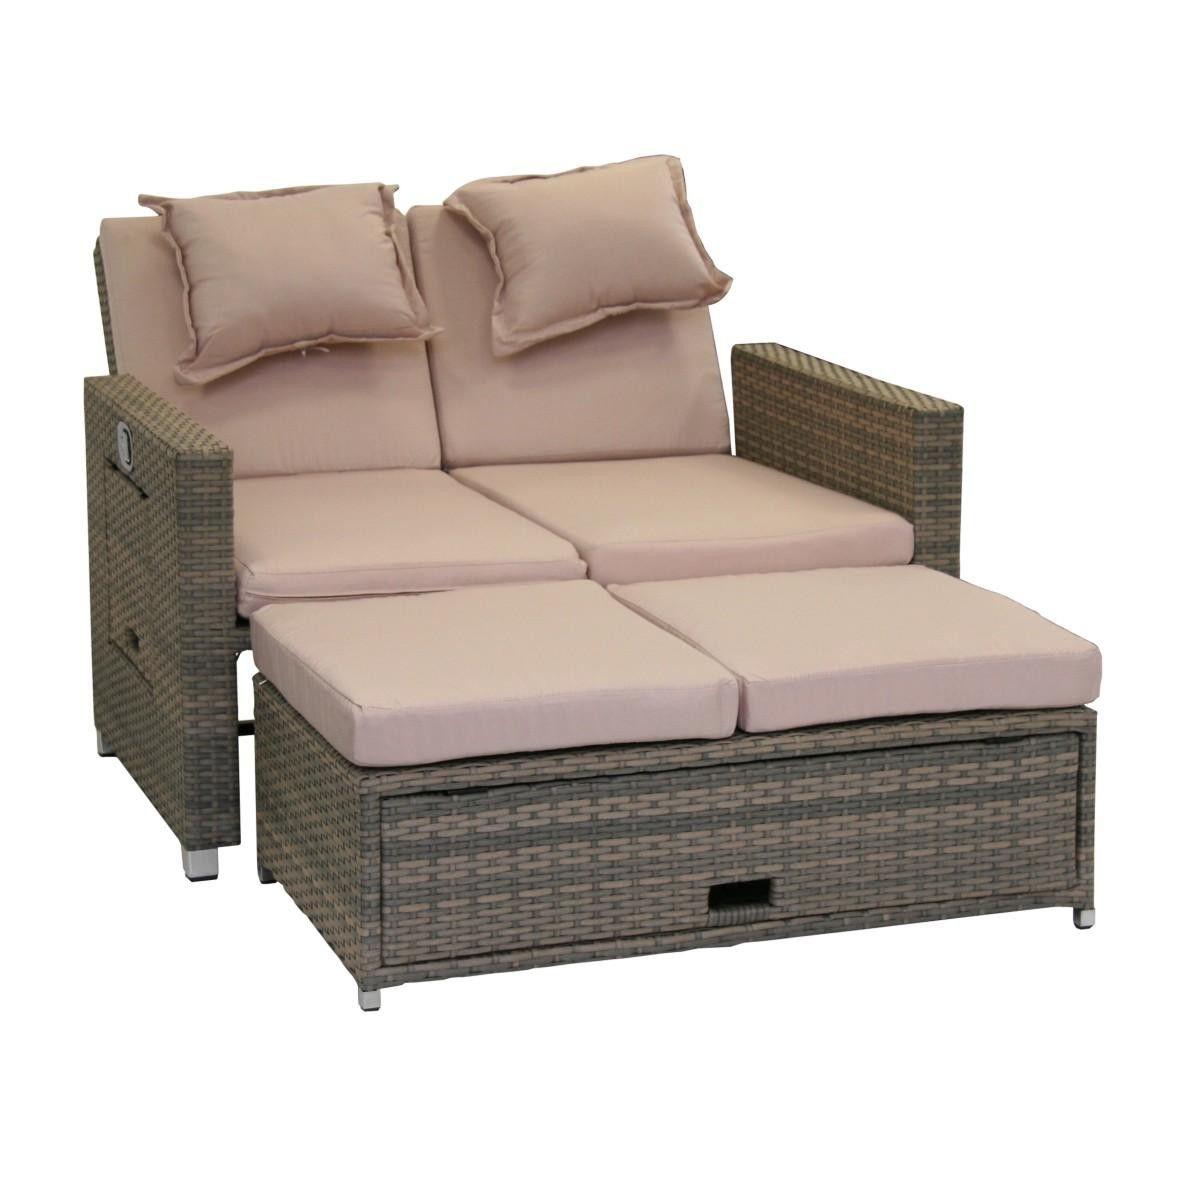 billig sofa Billig sofa gartenmöbel | Deutsche Deko | Pinterest billig sofa